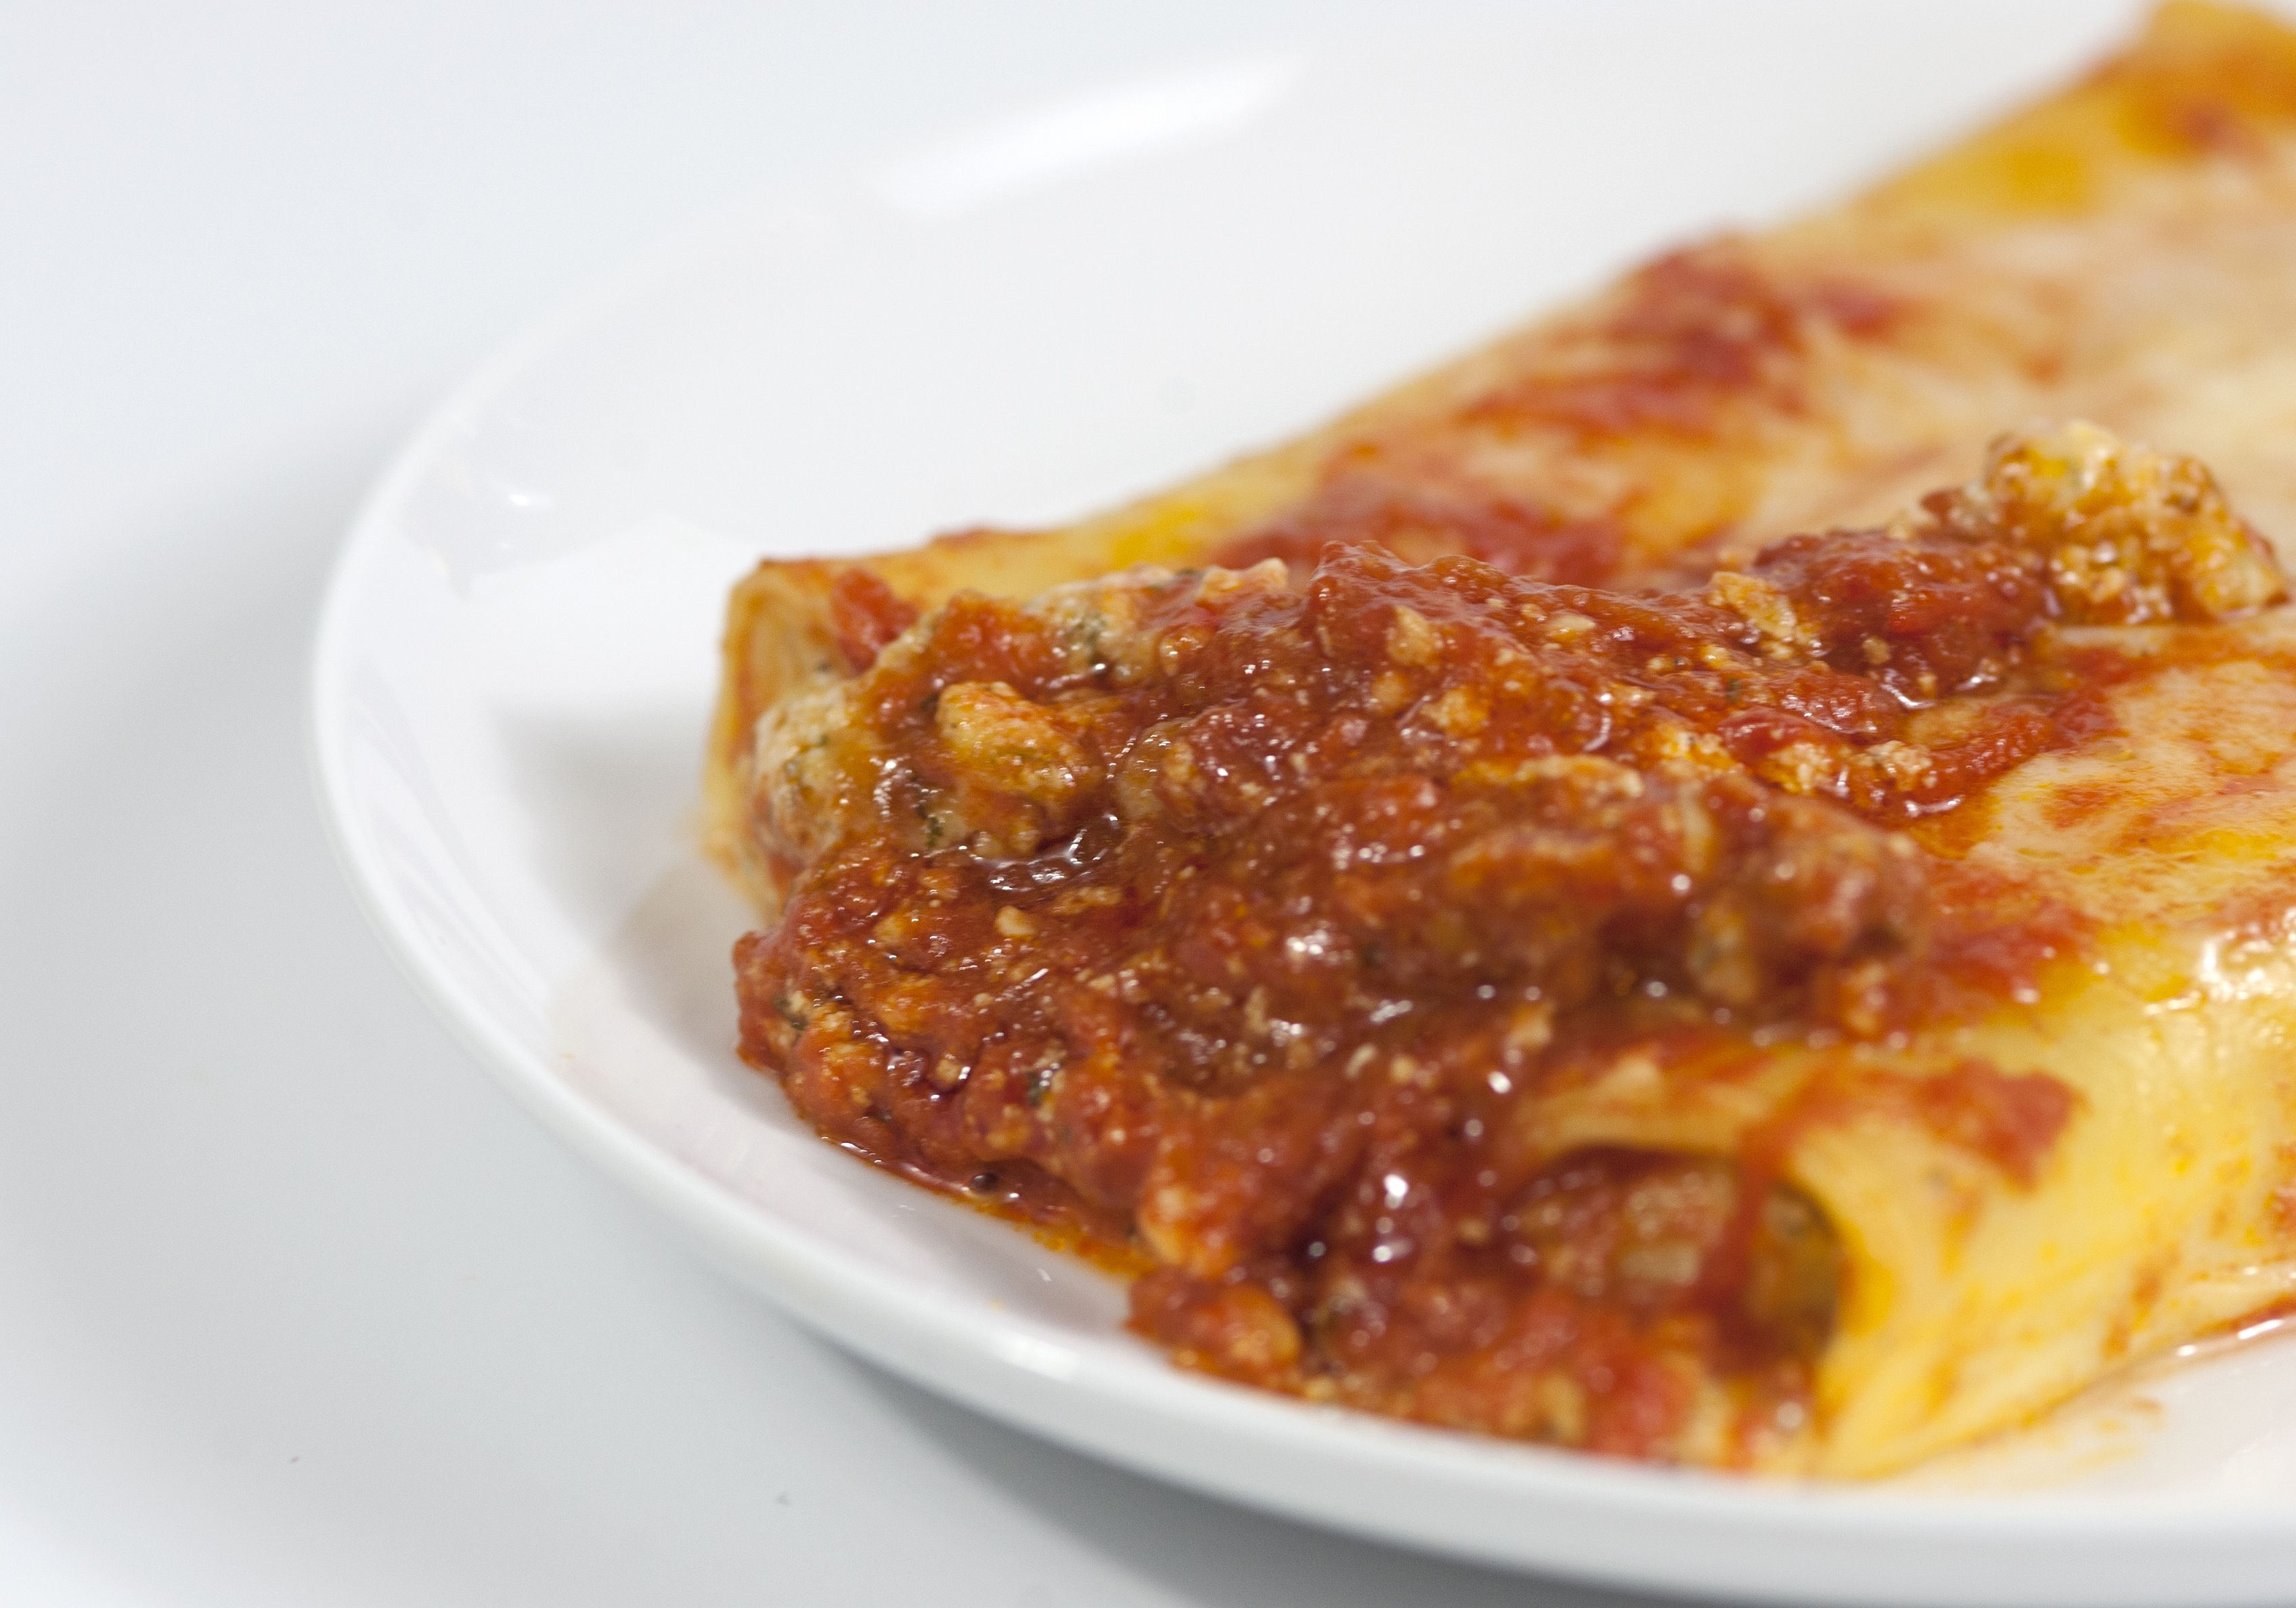 vendita uk chic classico migliori offerte su Lidia Celebrates America | Pasta, meatballs & sauces ...